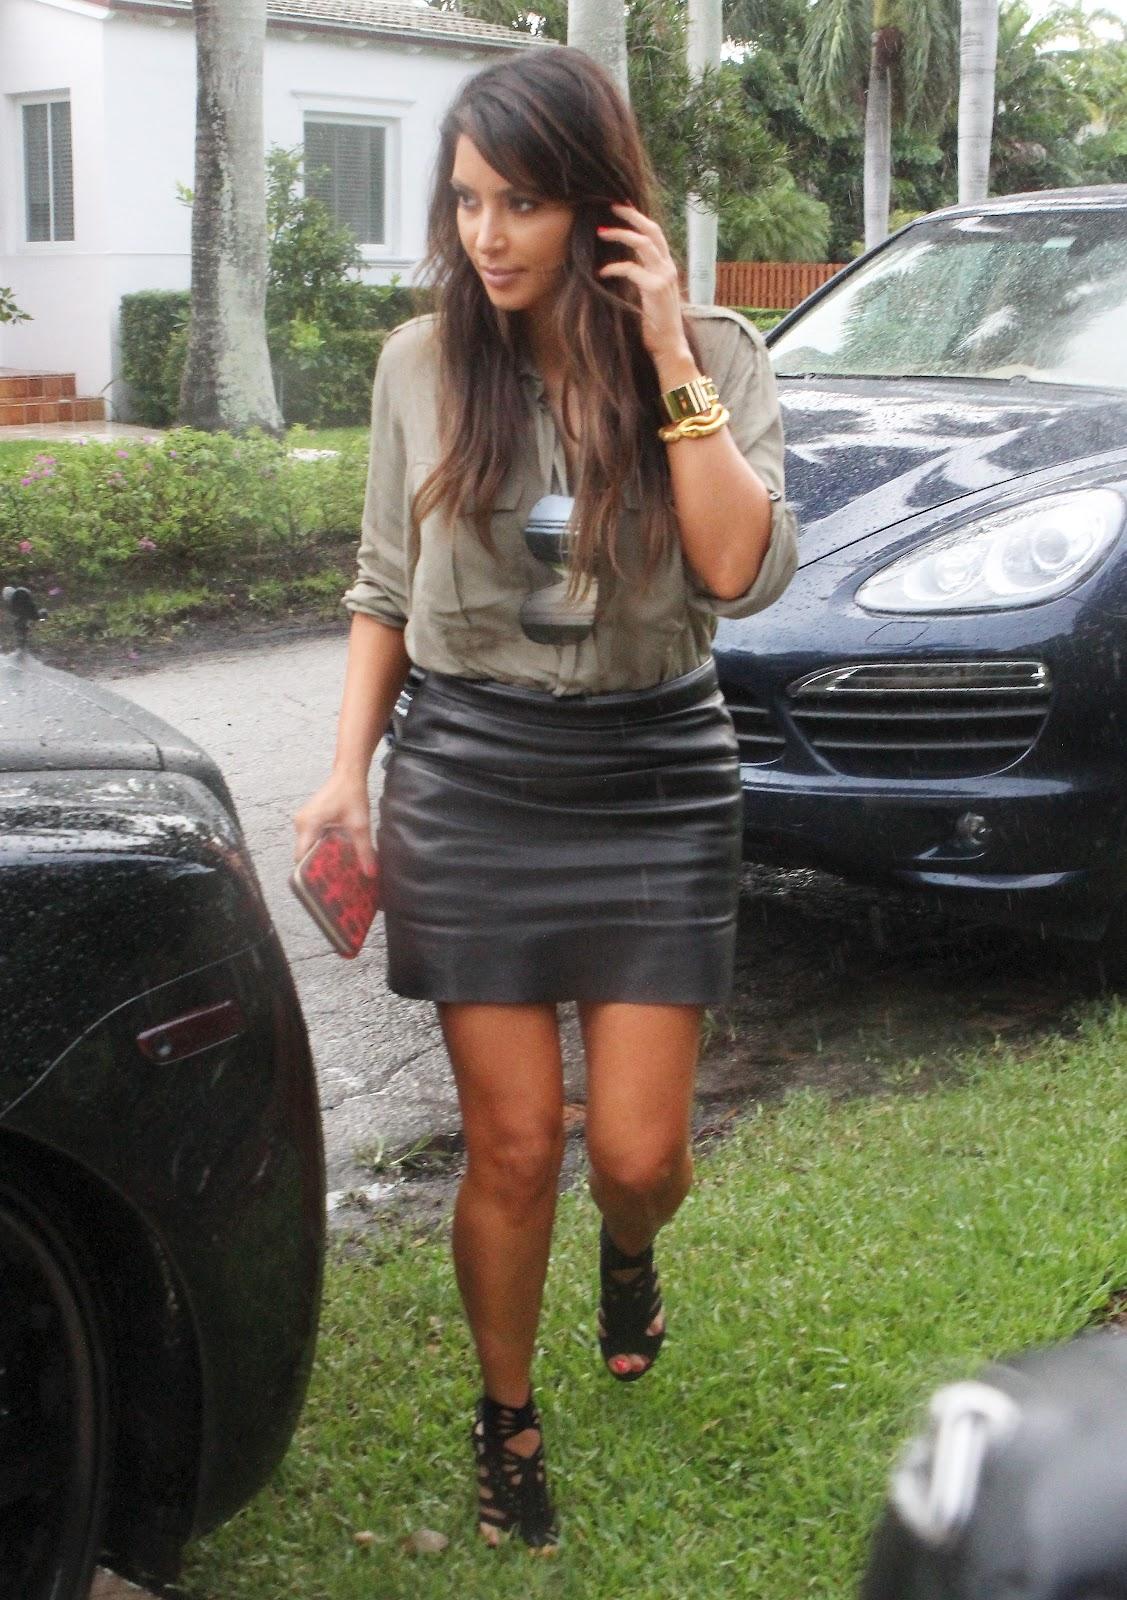 http://4.bp.blogspot.com/-0goG0c4escQ/UHQXliZNnHI/AAAAAAAAR7c/_C8fmi0M6hc/s1600/Kim+Kardashian+at+Prime+One+Twelve+and+house+hunting+in+Miami+Beach-03.jpg